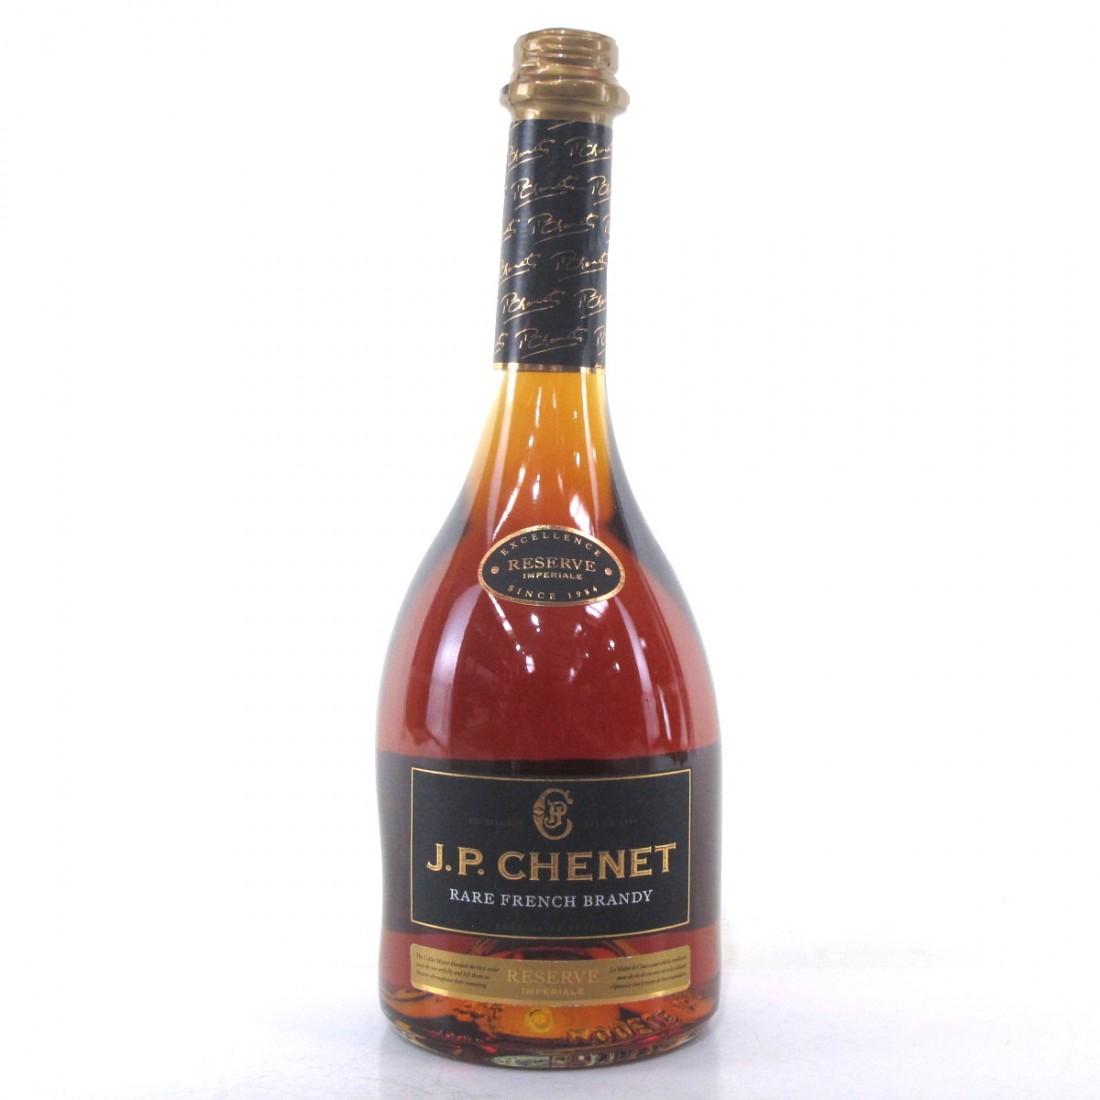 J.P. Chenet Reserve Imperiale Brandy